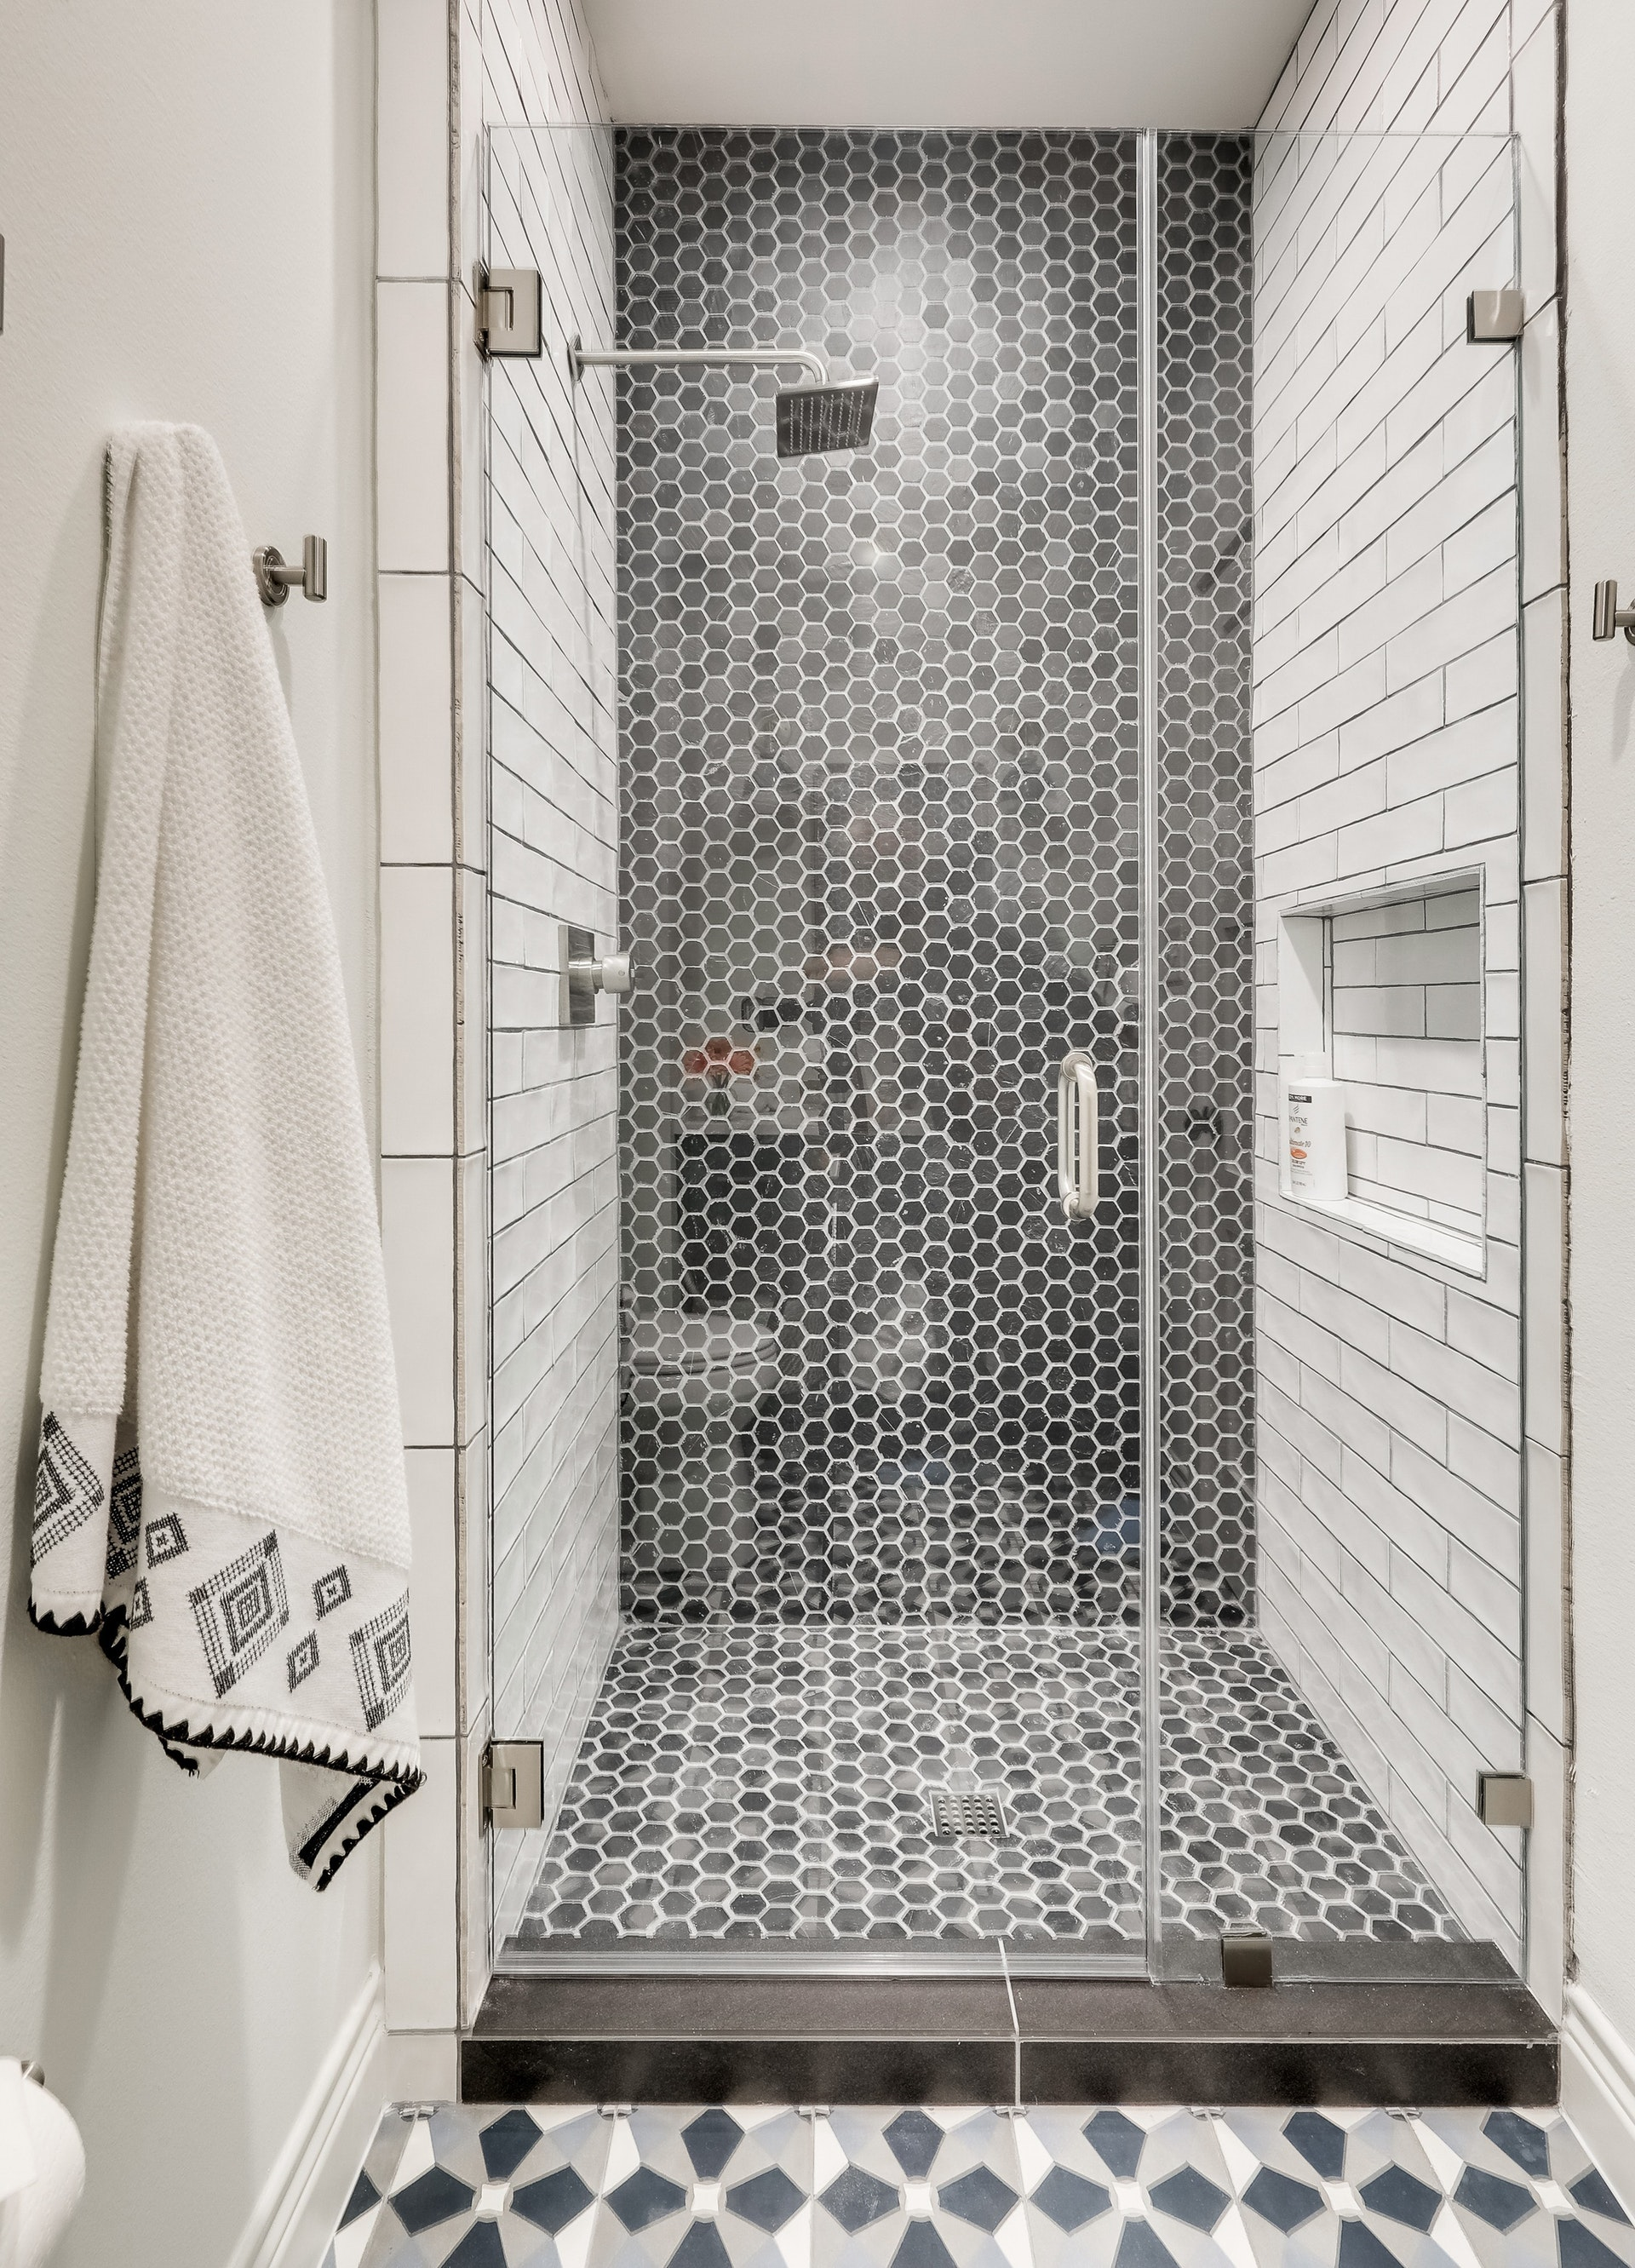 Modern Farmhouse BnB Bathroom - Hex and Subway Tile Shower .jpg